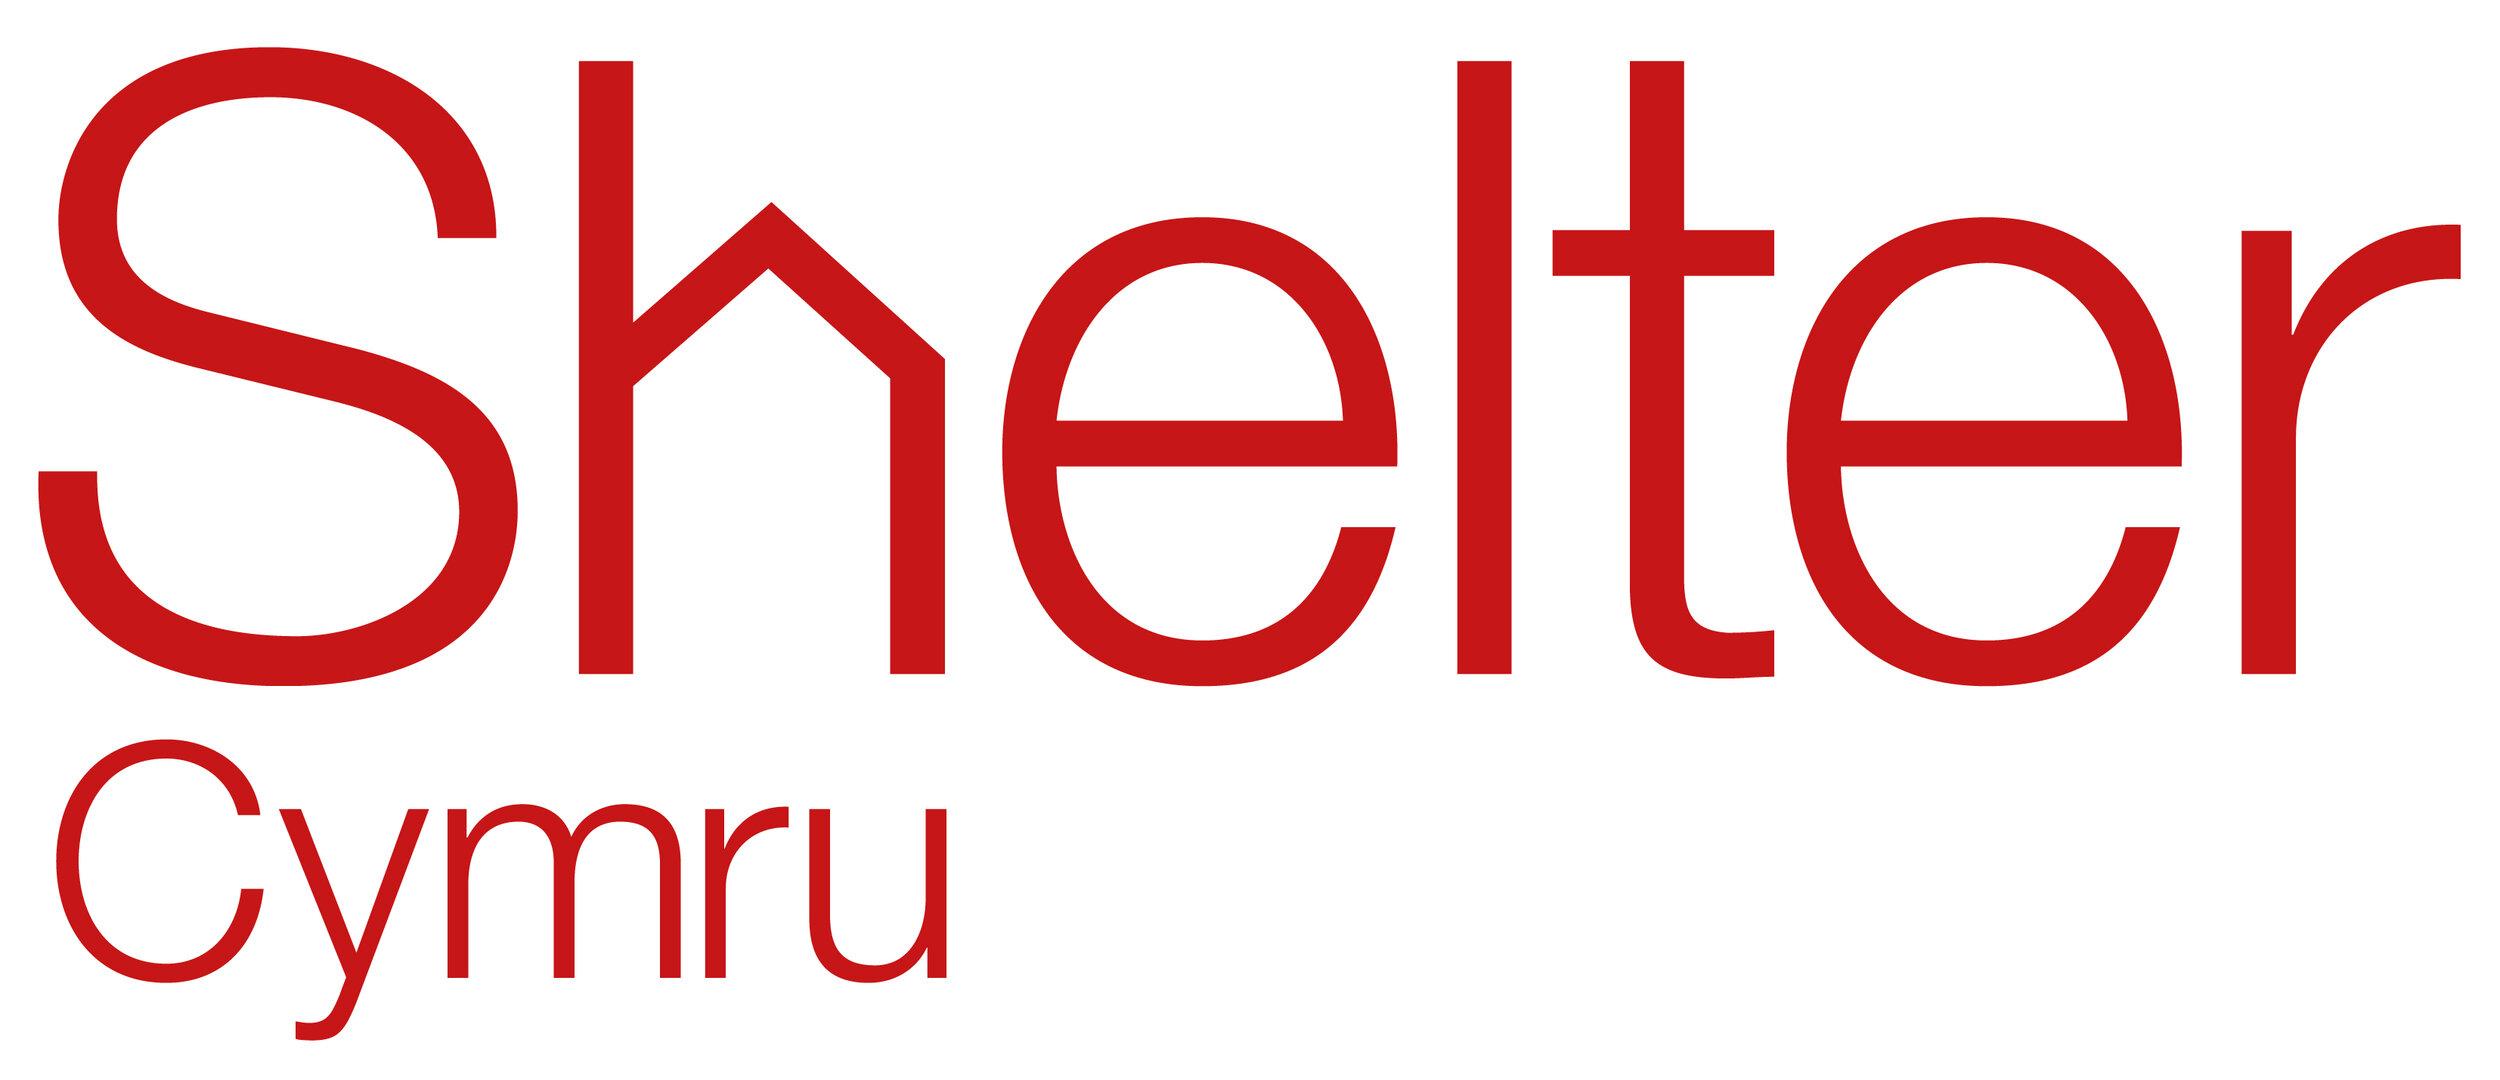 shelter-cymru-logo-red.jpg